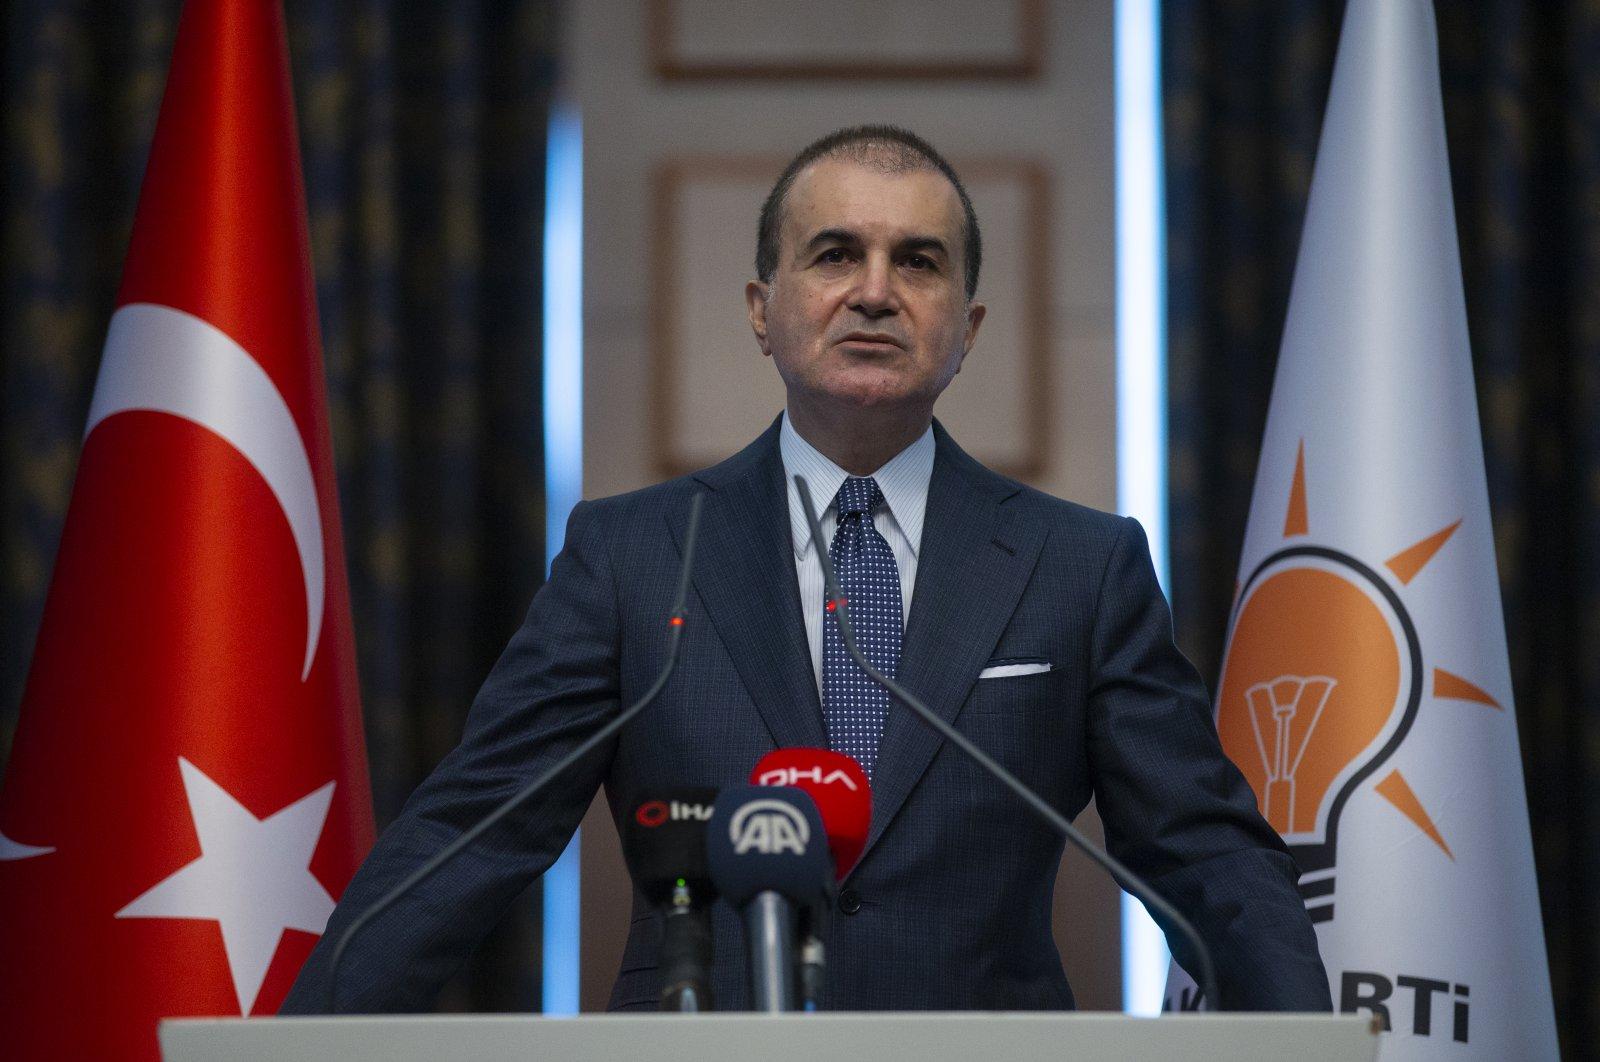 Ömer Çelik speaks at a news conference in Ankara, Turkey, May 4, 2020. (AA Photo)